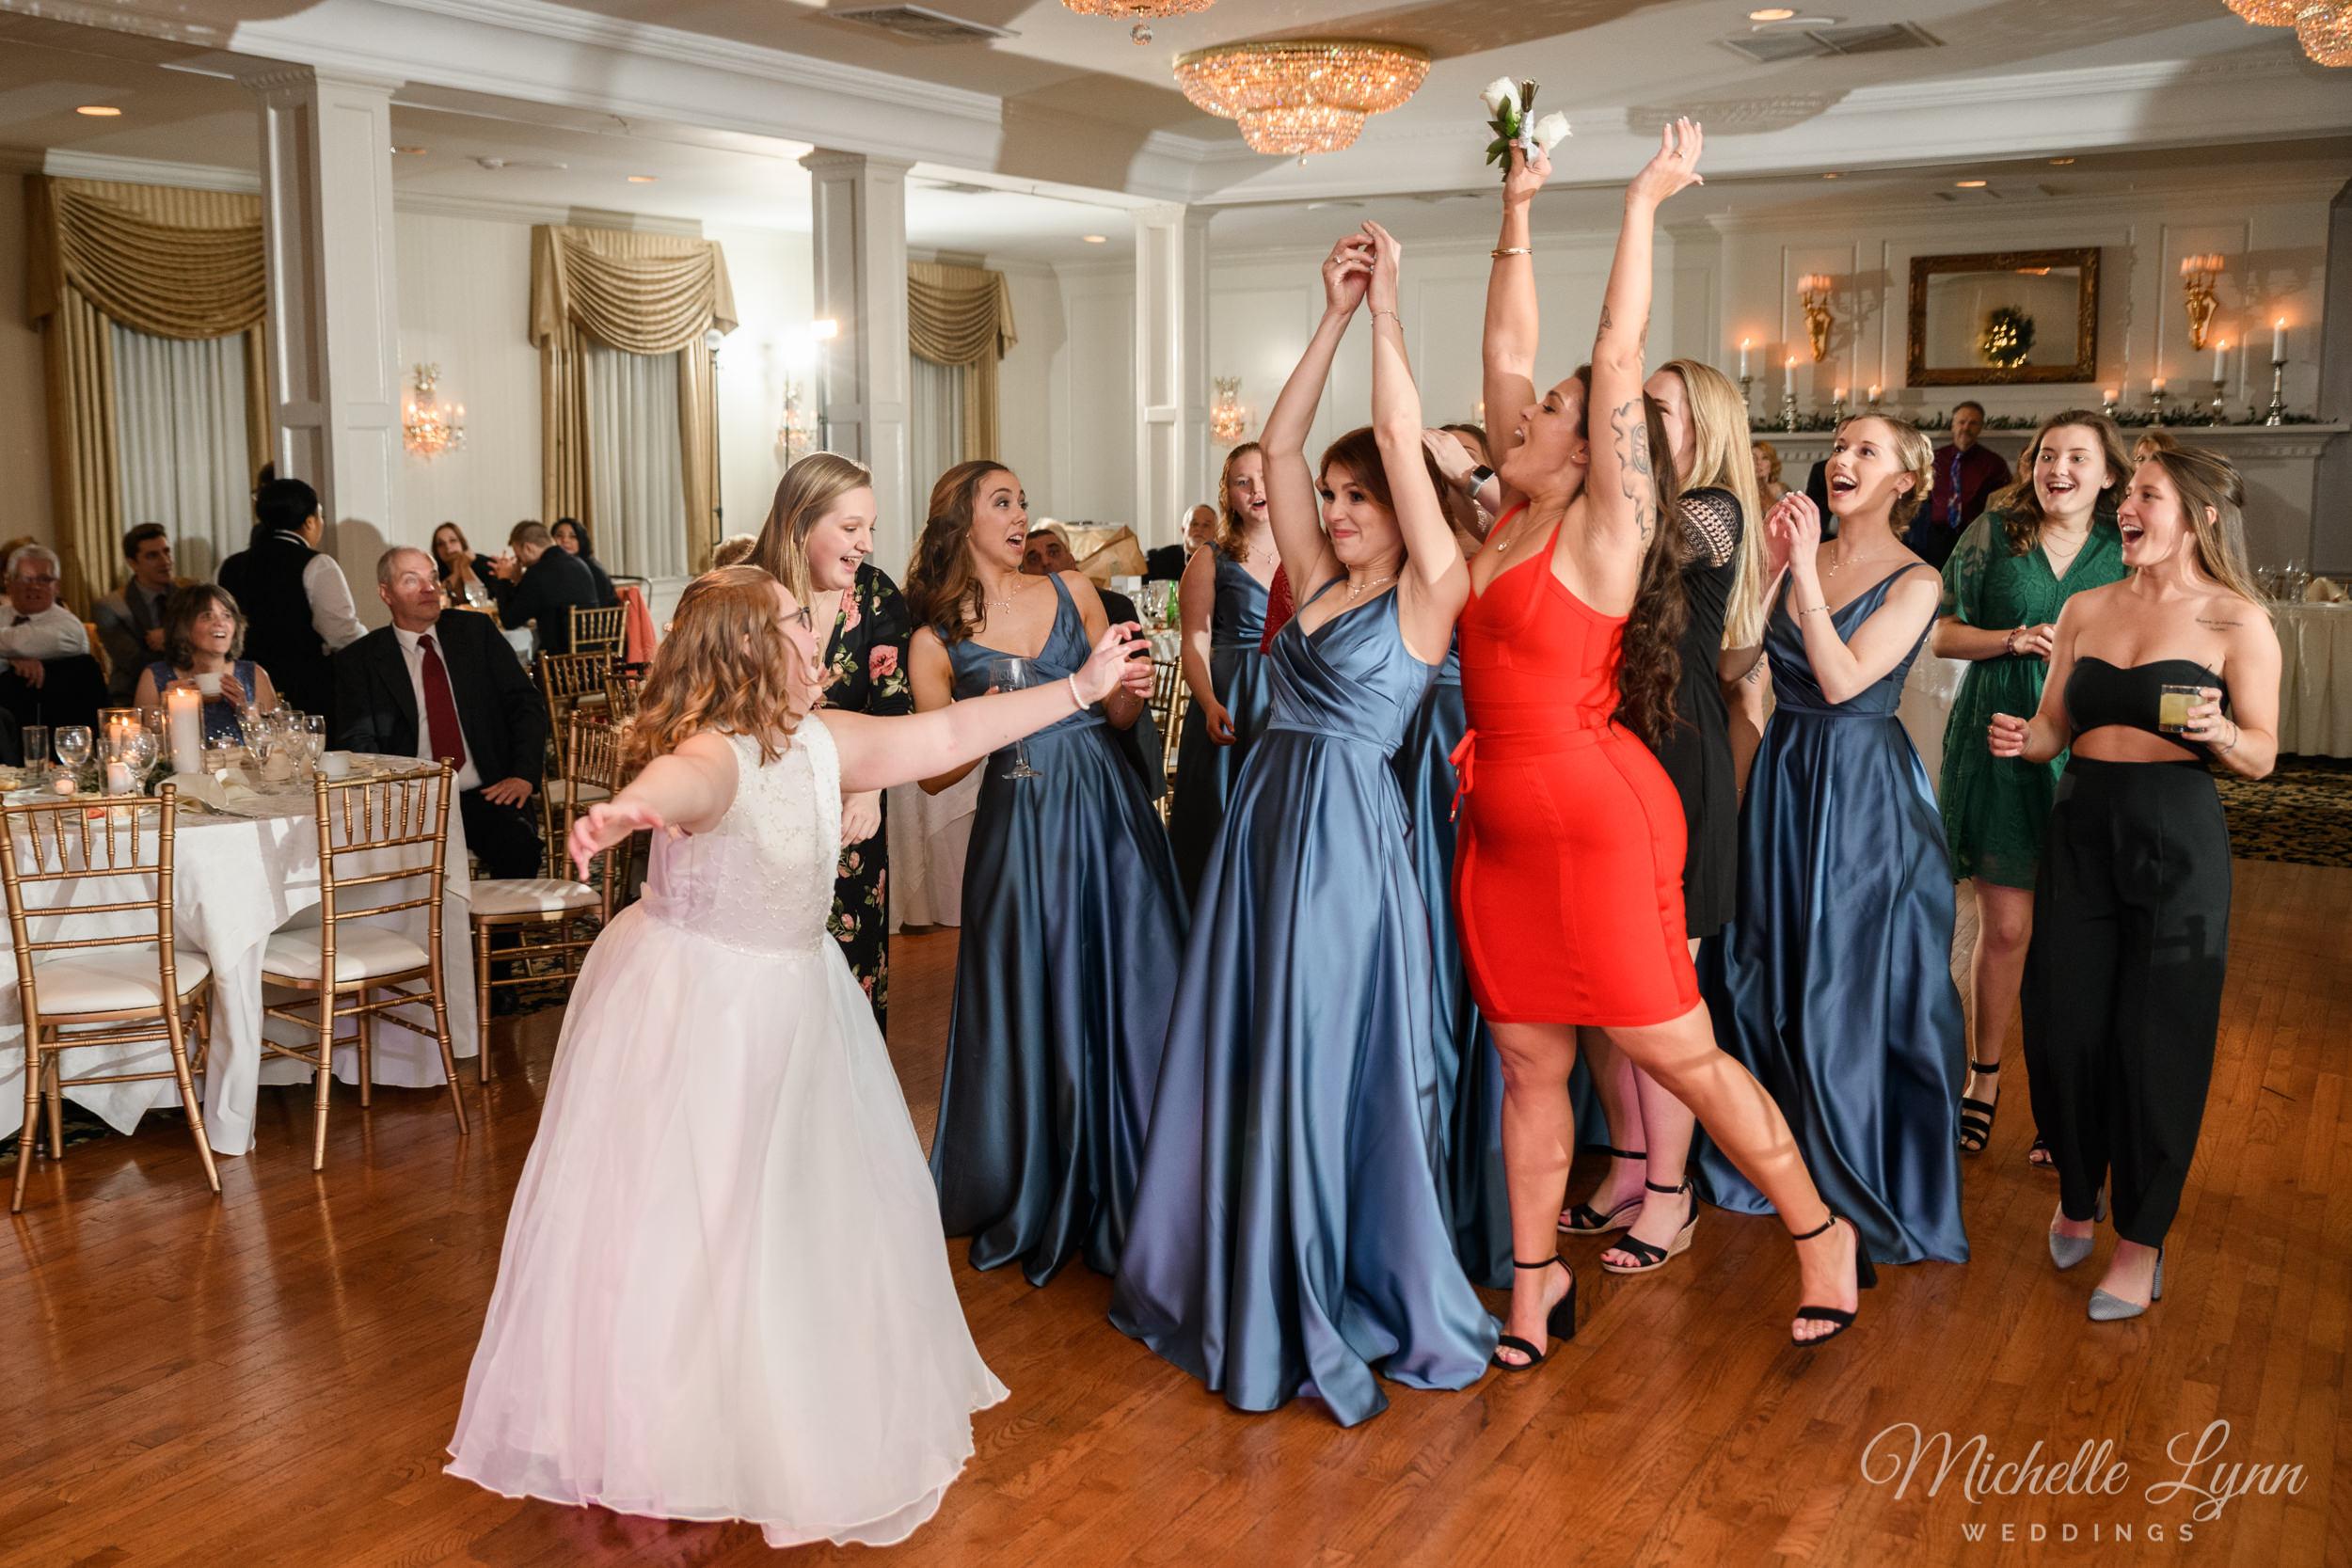 william-penn-inn-wedding-photography-mlw-112.jpg